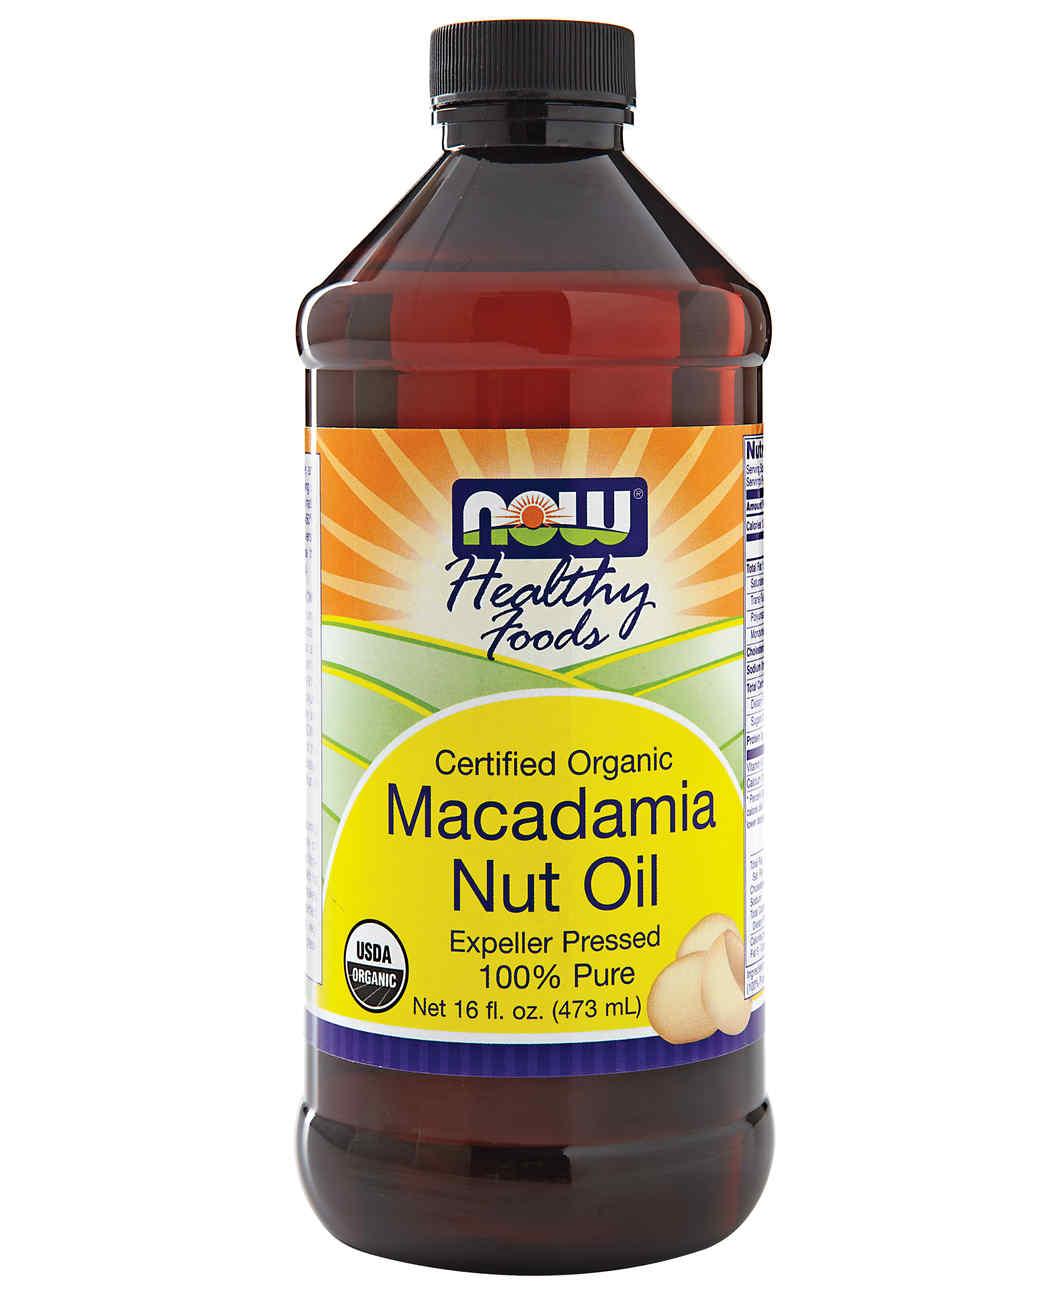 msl-healthy-living-oils-now-healthy-macadamia-md110058.jpg